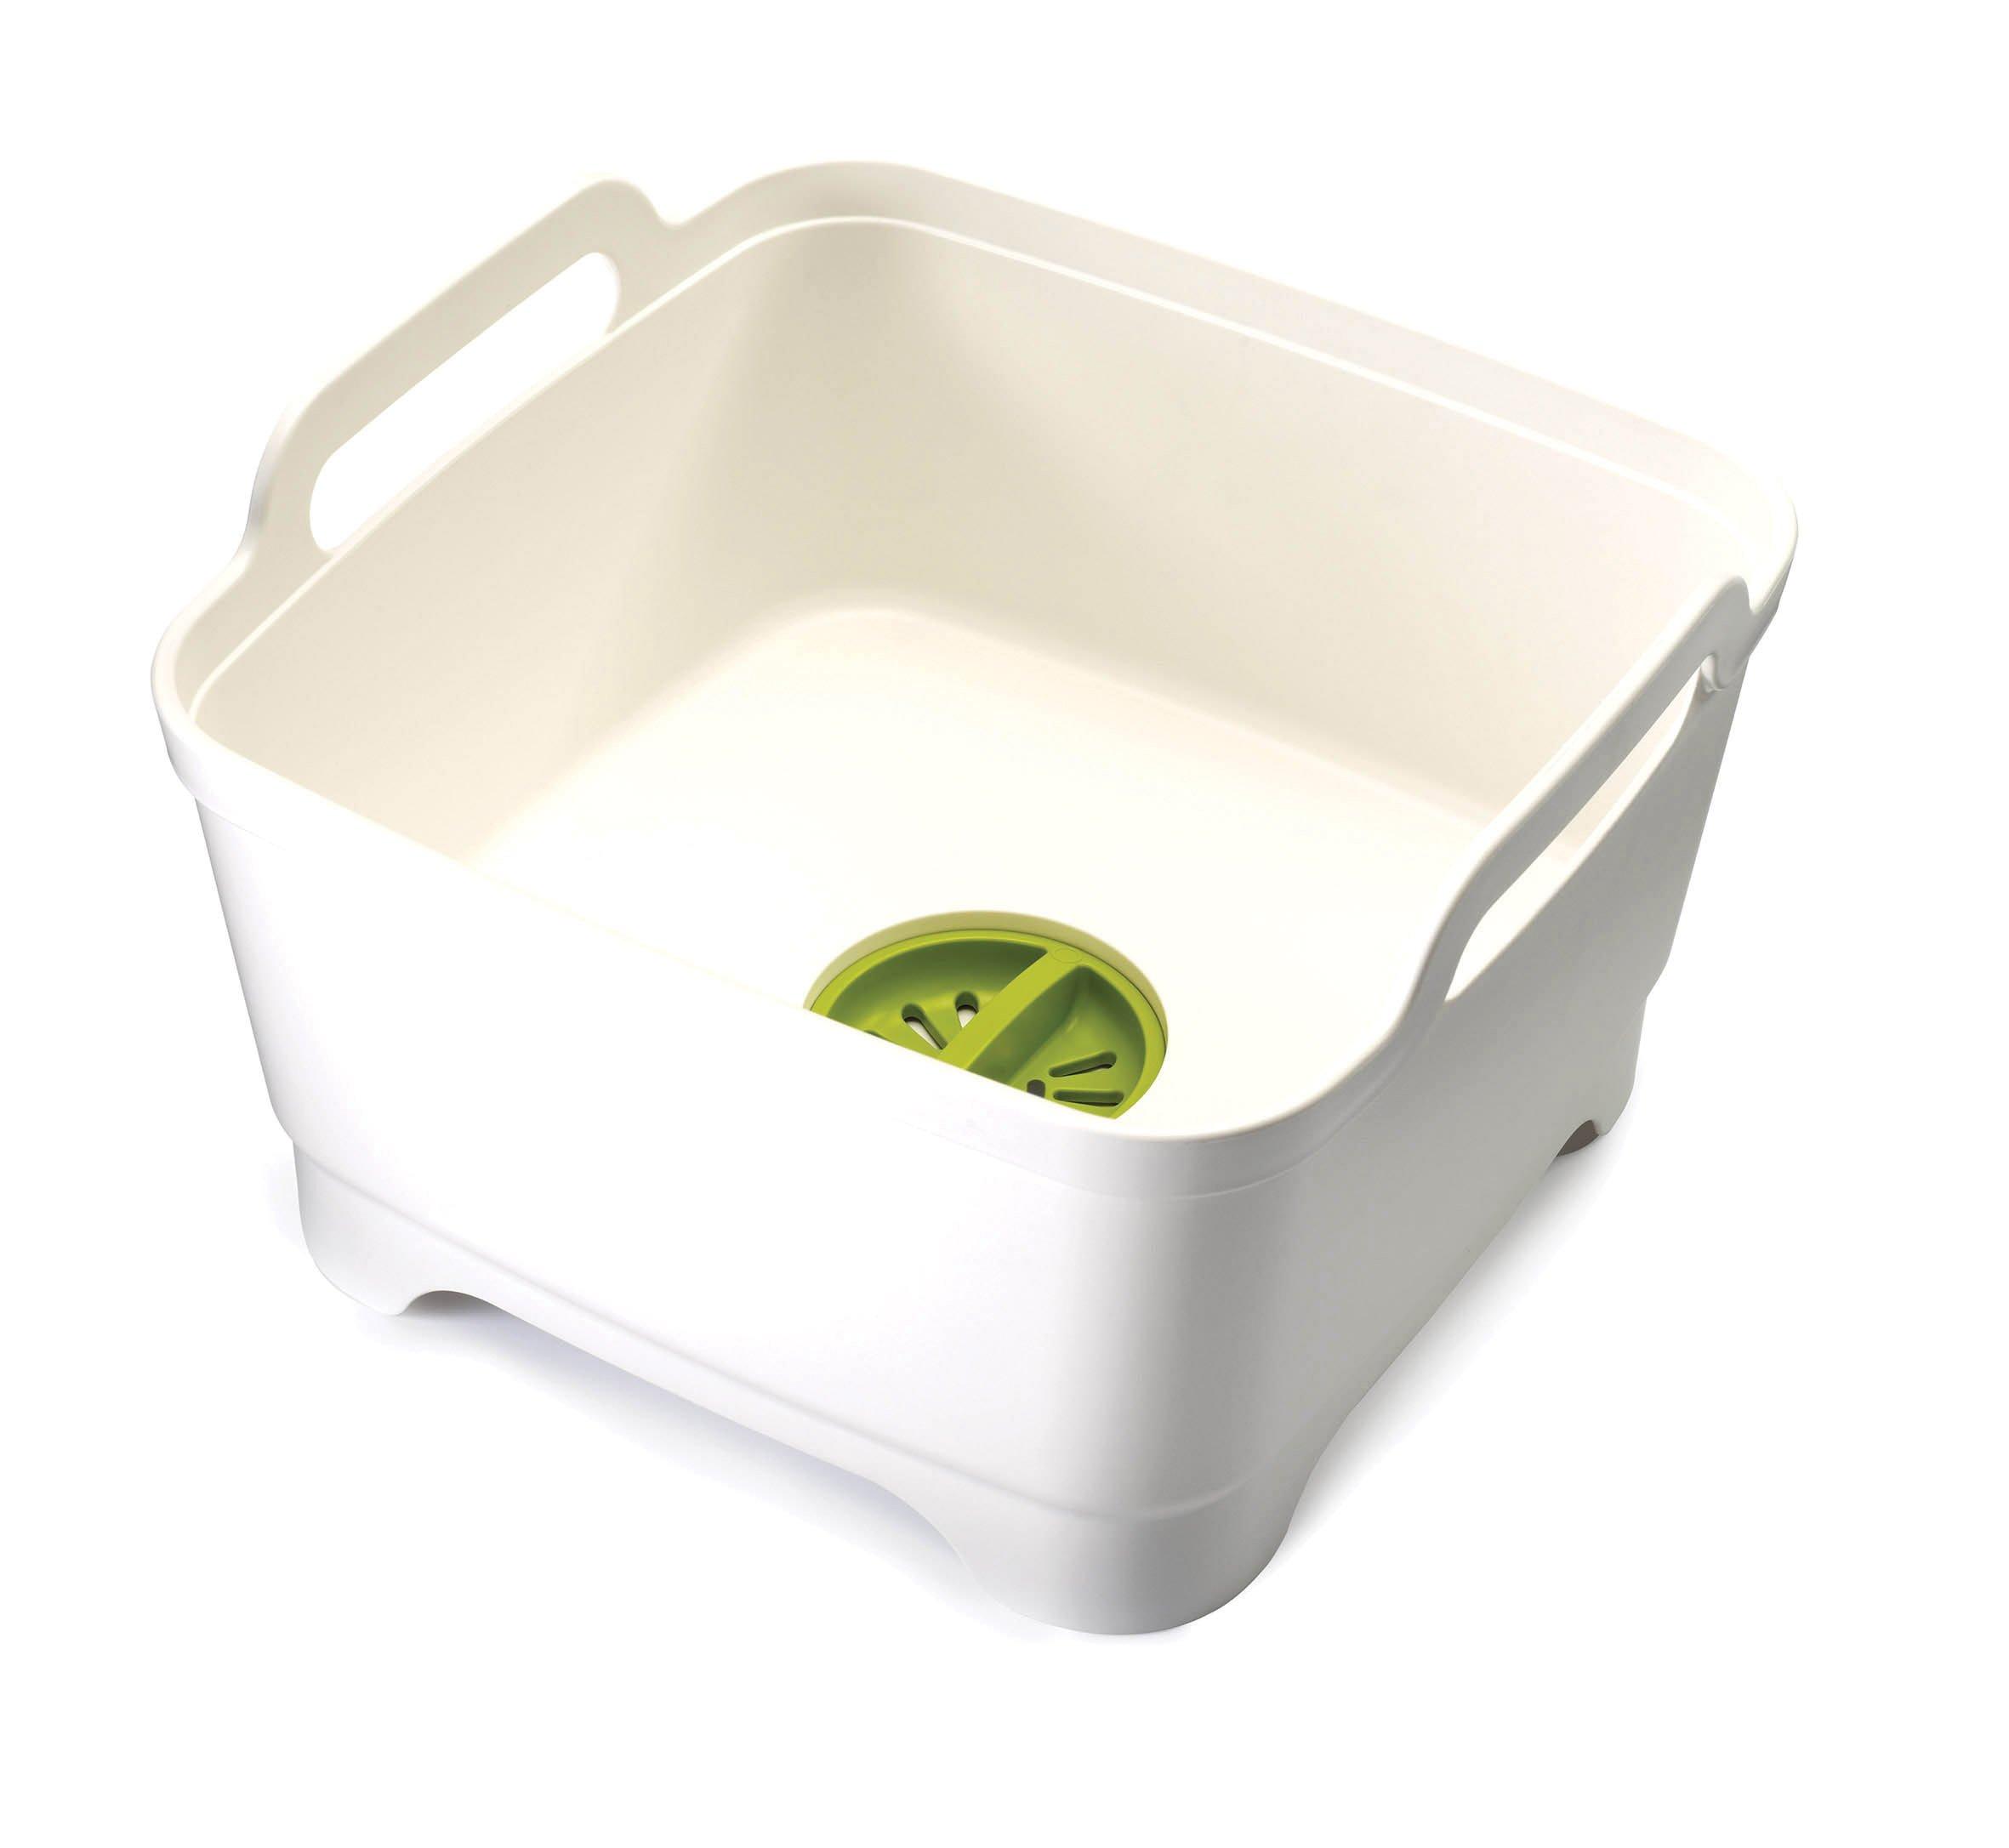 Joseph Joseph 85055 Wash & Drain Wash Basin Dishpan with Draining Plug Carry Handles 12.4-in x 12.2-in x 7.5-in, White by Joseph Joseph